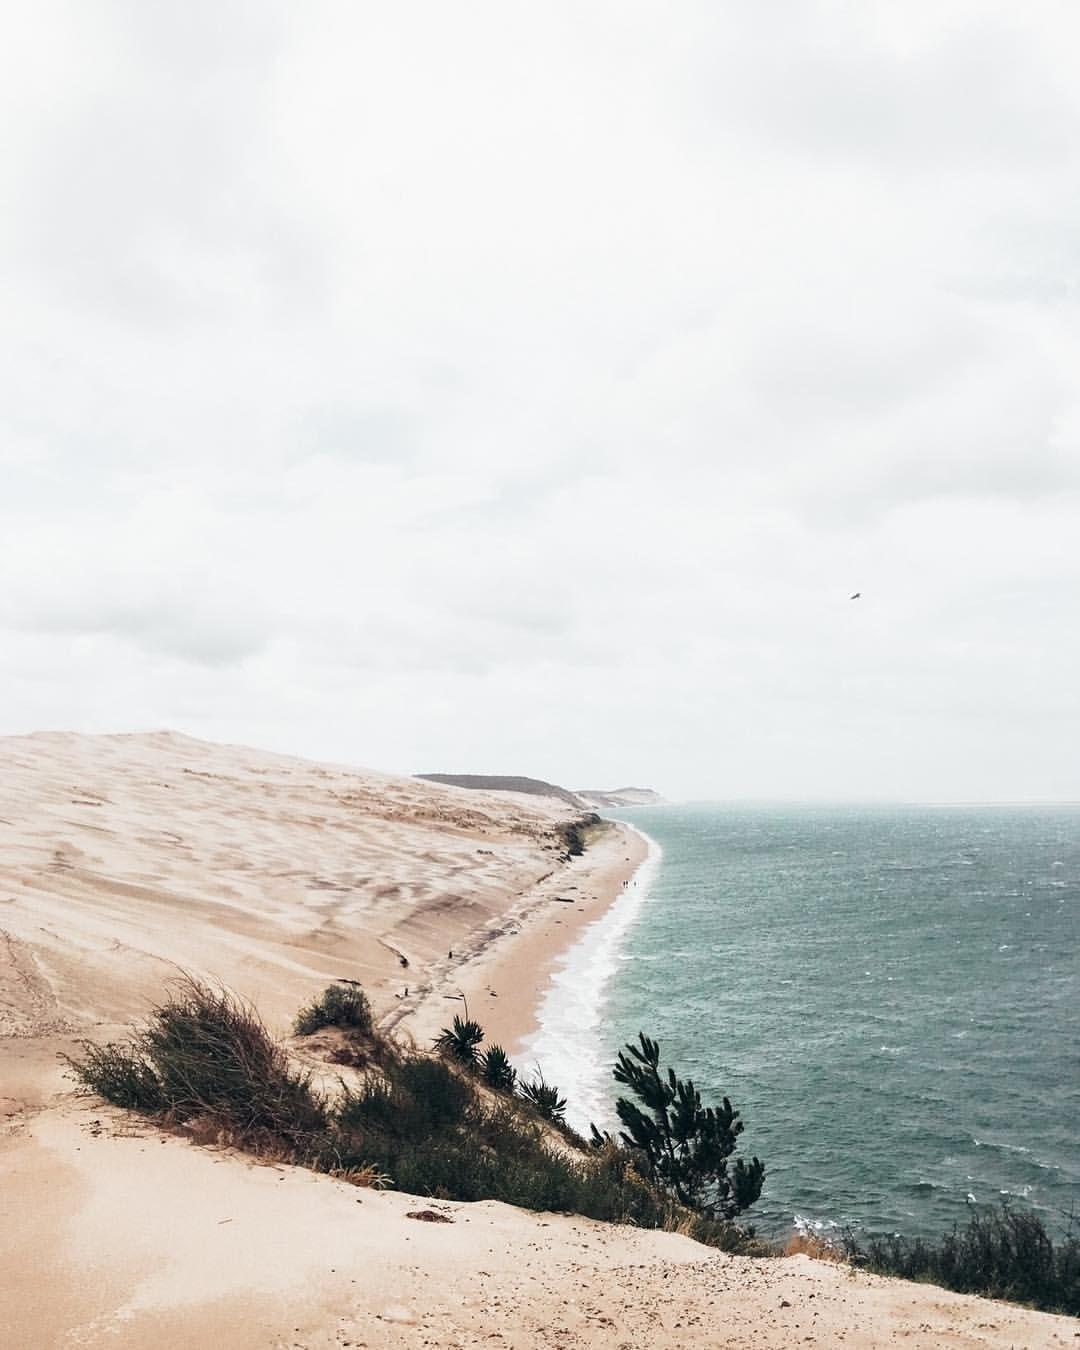 890 Mentions J Aime 12 Commentaires Sunrise Over Sea Sunrise Over Sea Sur Instagram Home Reiseziele Schone Orte Reisebilder